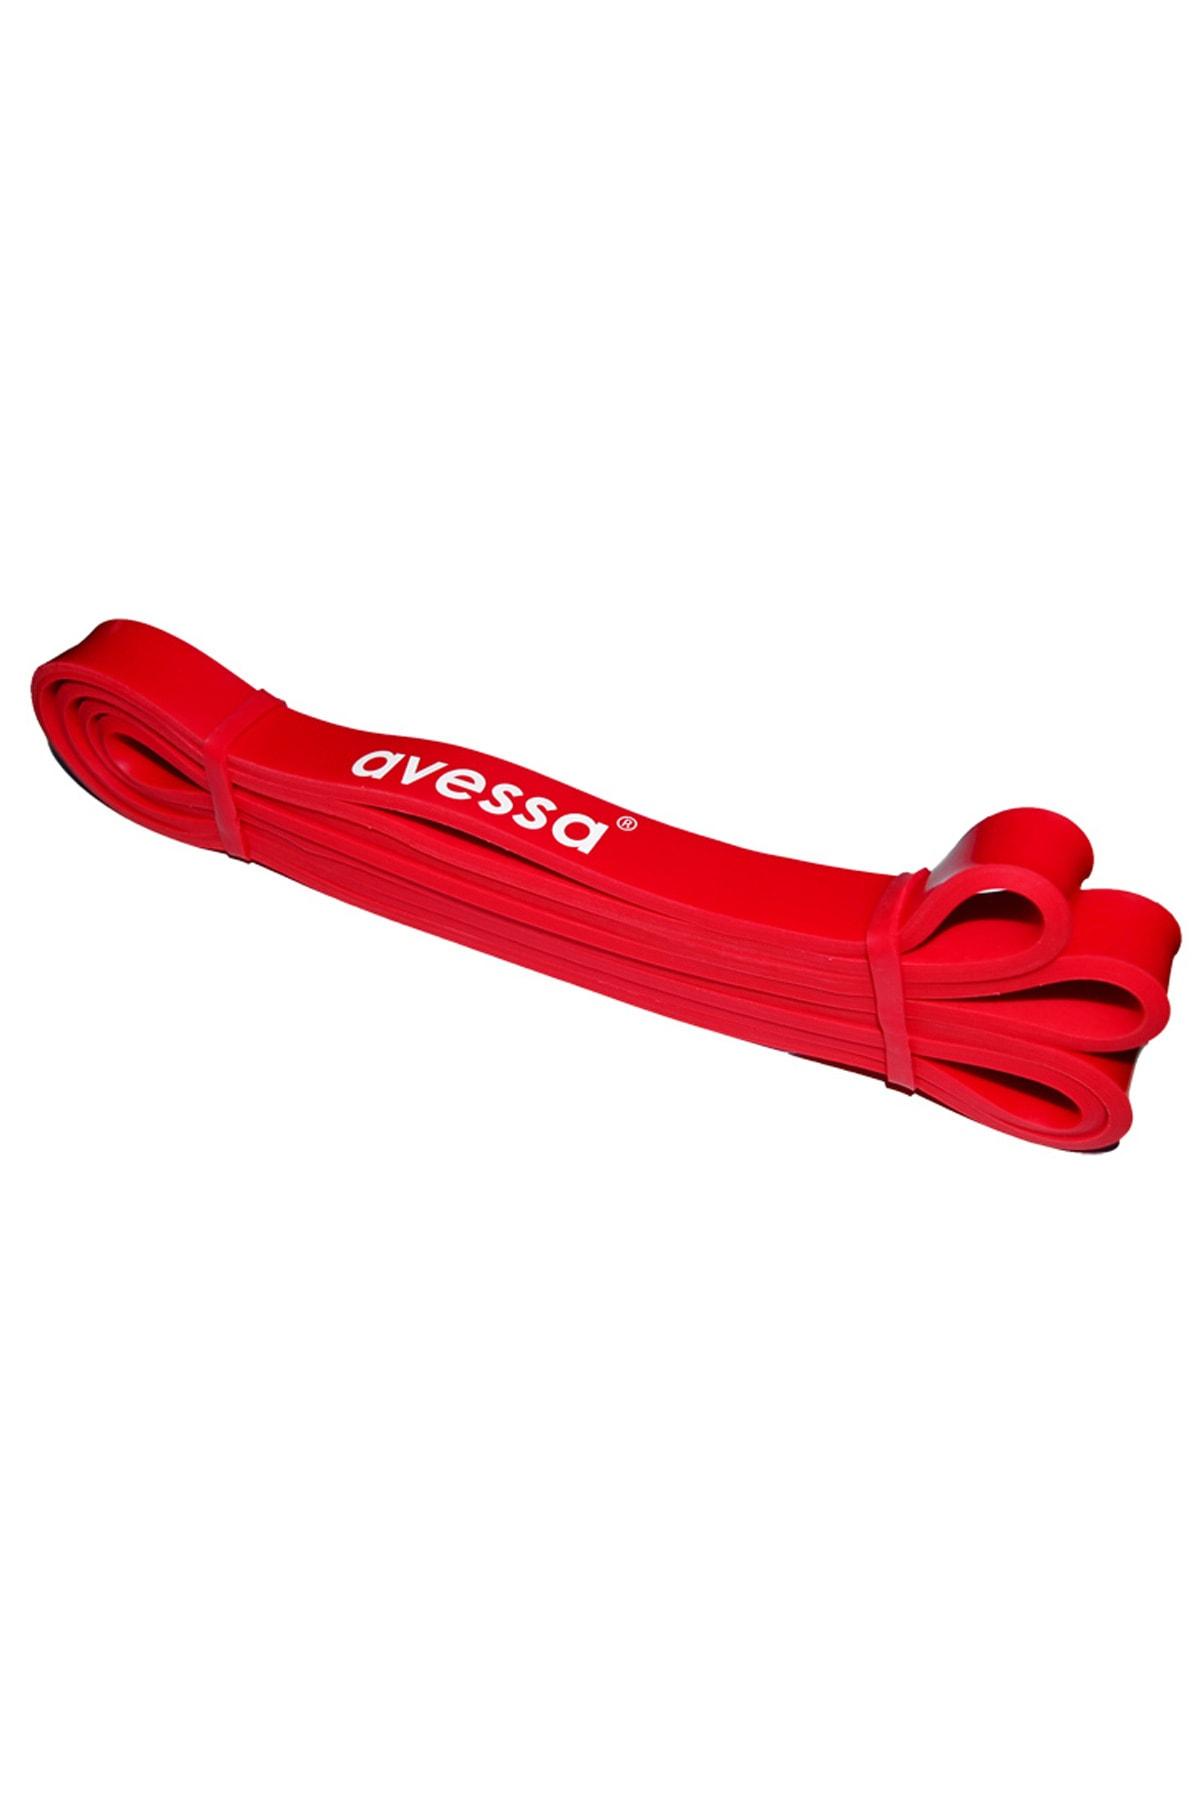 AVESSA Latex Güç Bandı Direnç Lastiği Kırmızı Lpb-21 1